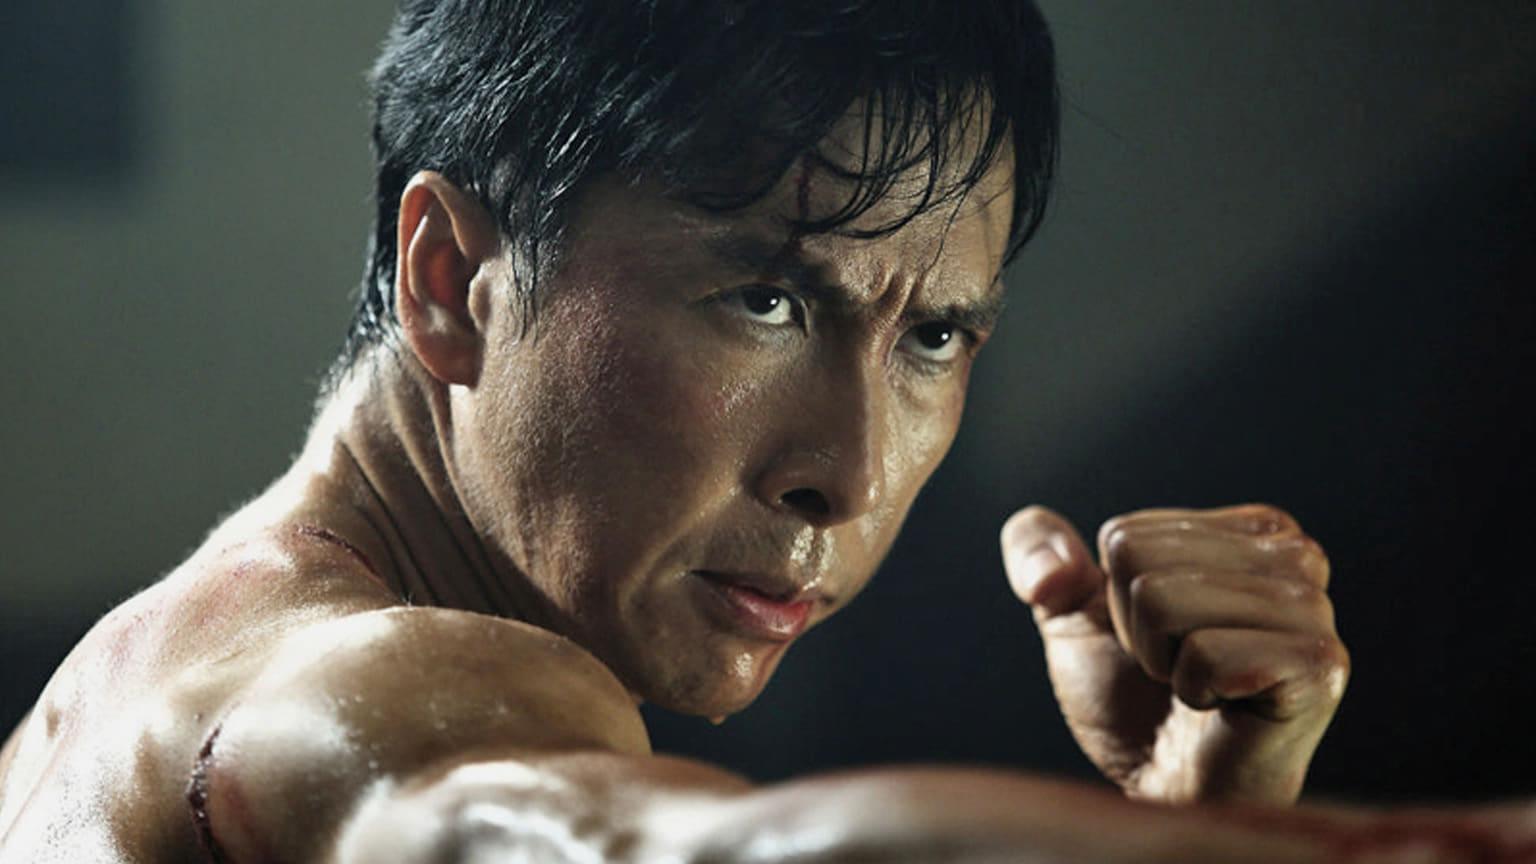 Legend of the Fist: Return of Chen Zhen